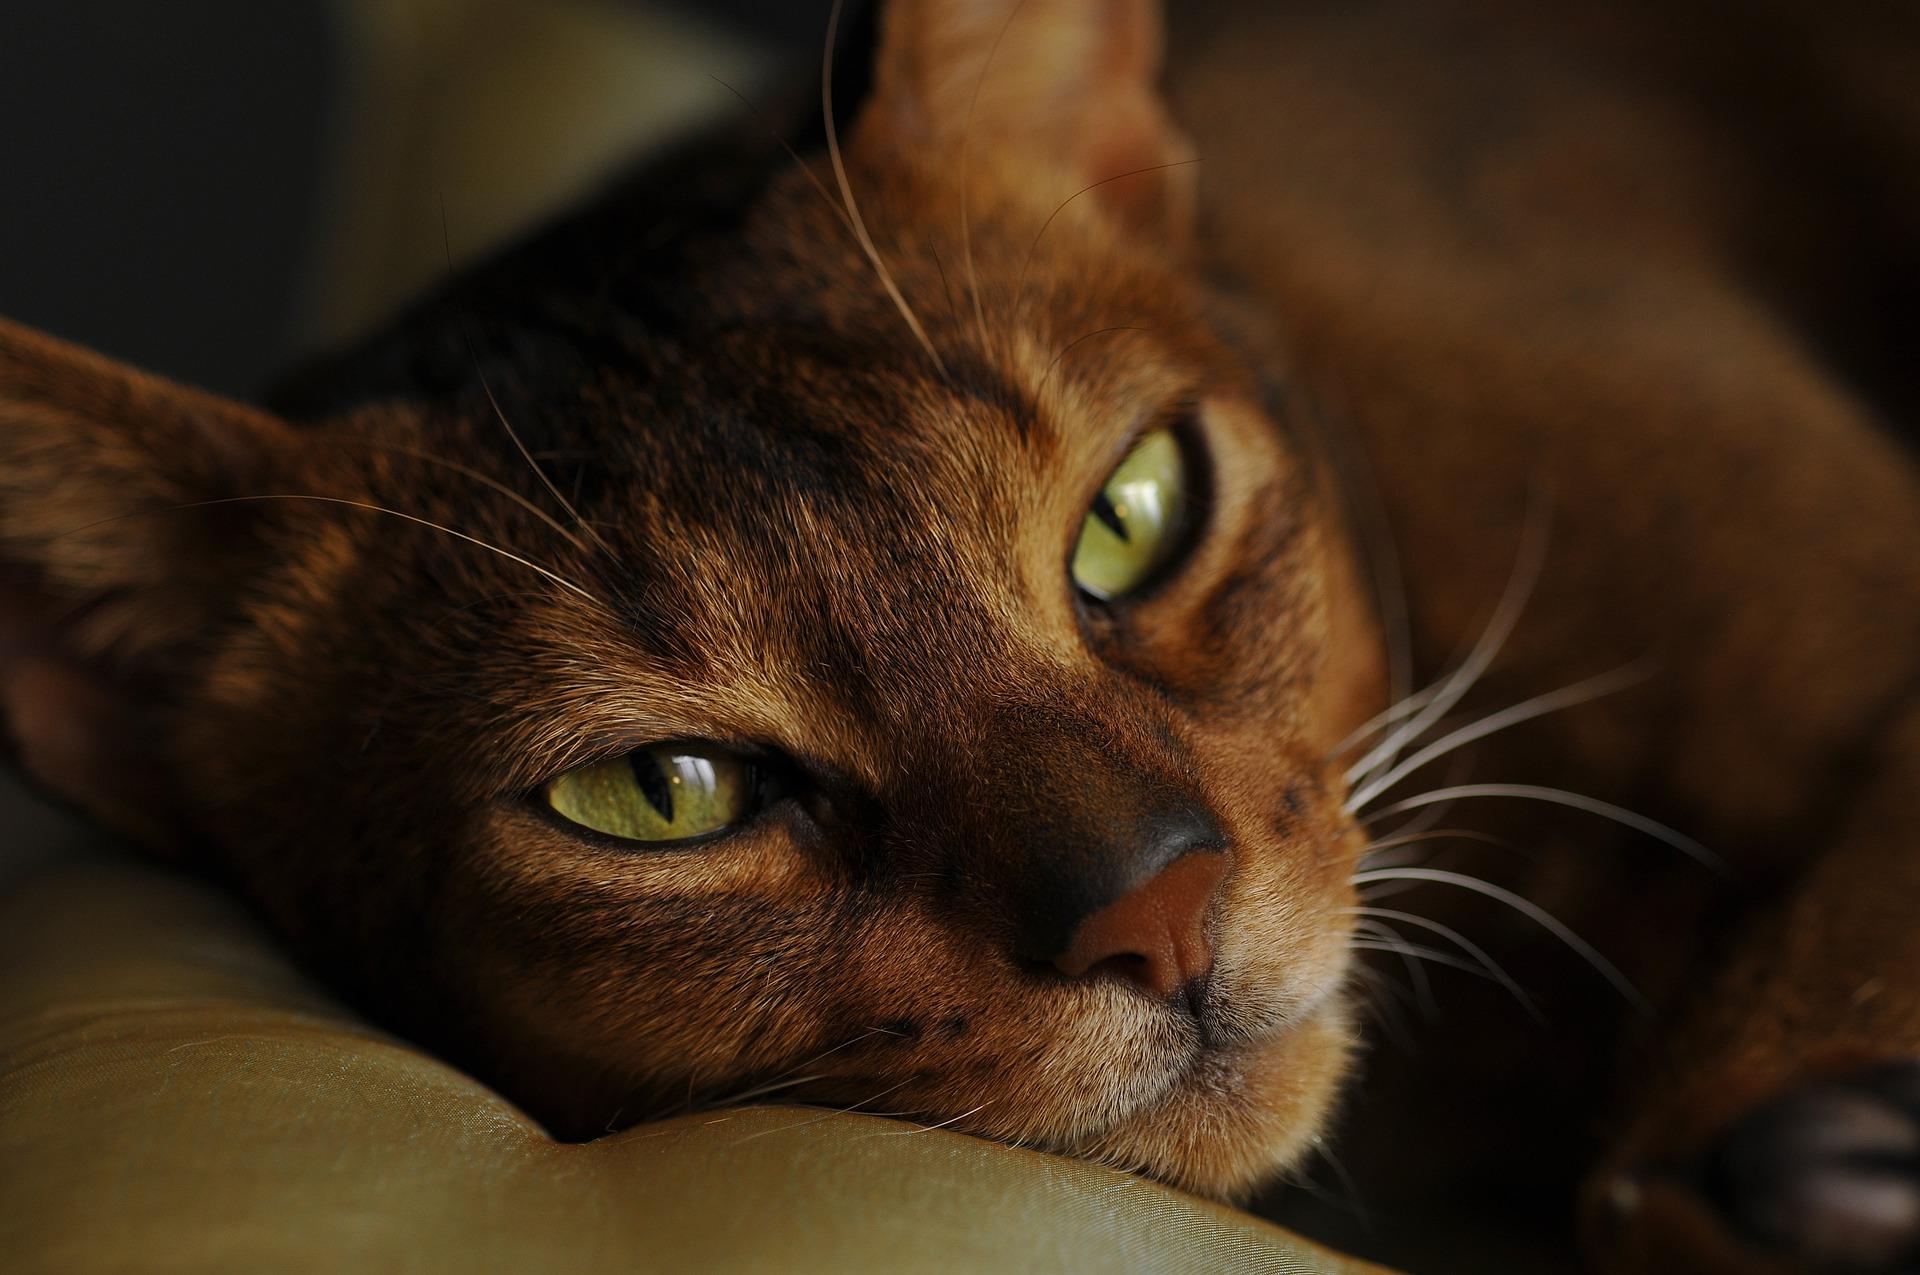 Абиссинская кошка с независимым характером